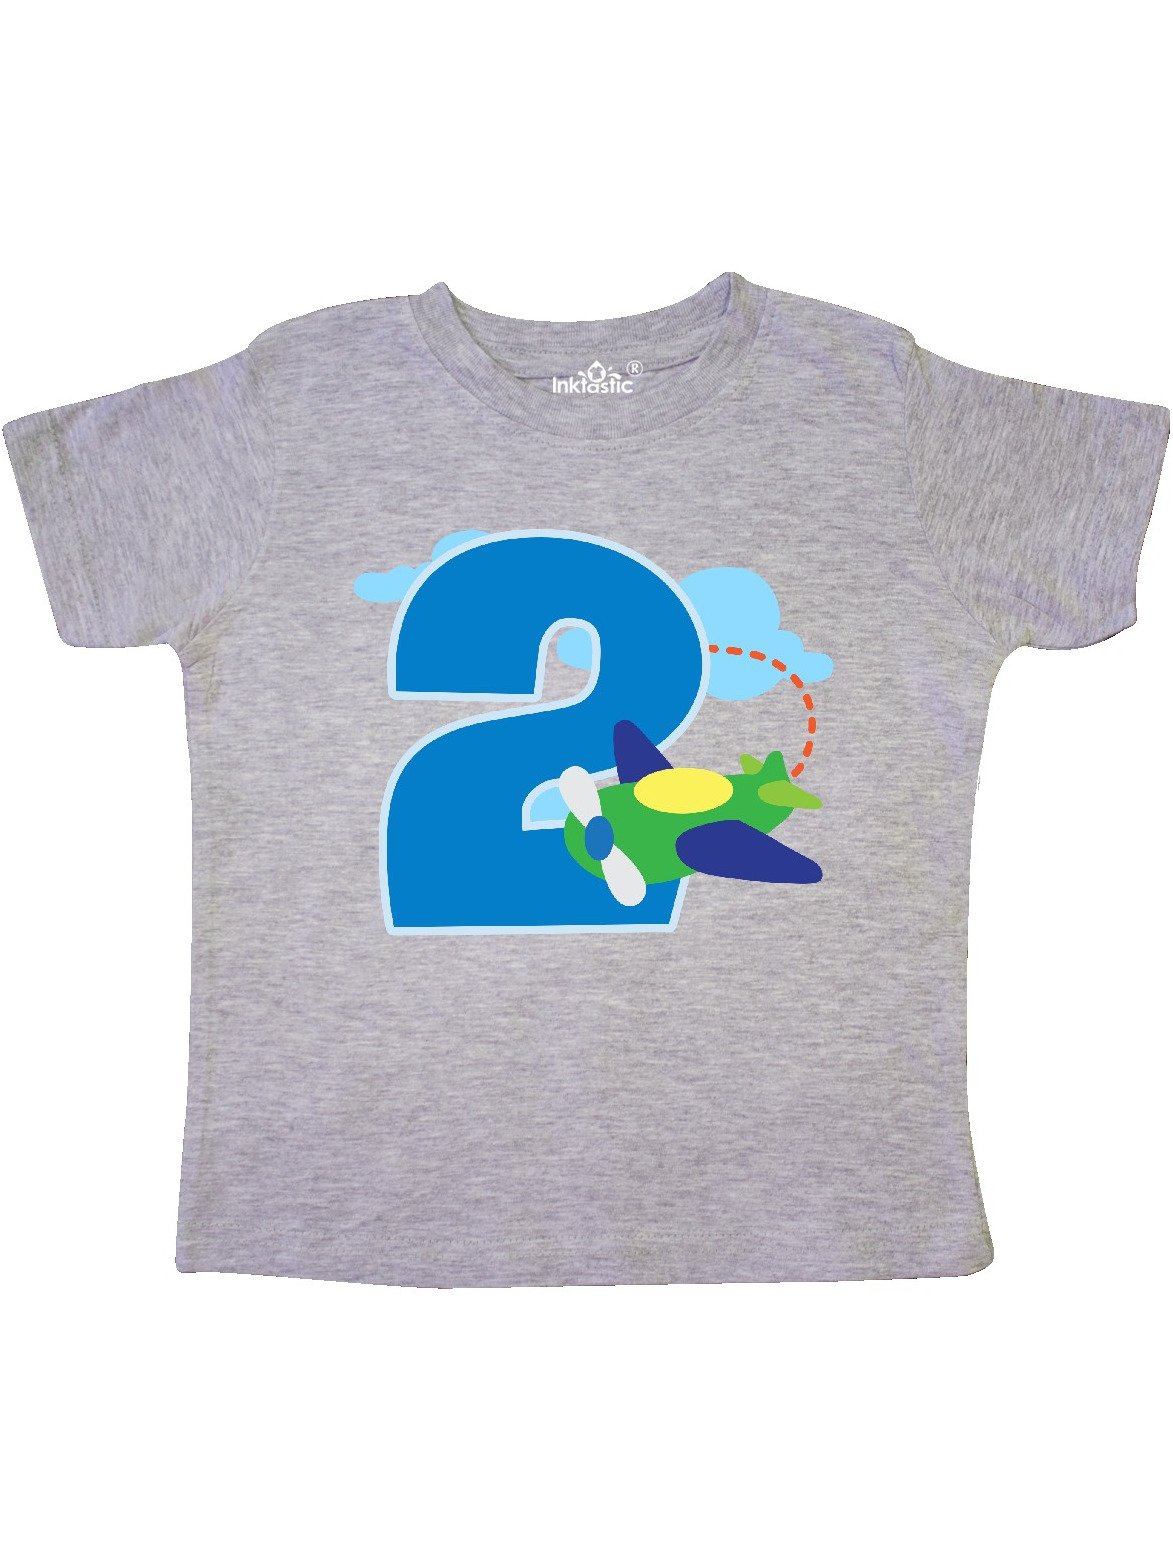 2nd Birthday Airplane Boys 2 Year Old Toddler T-Shirt